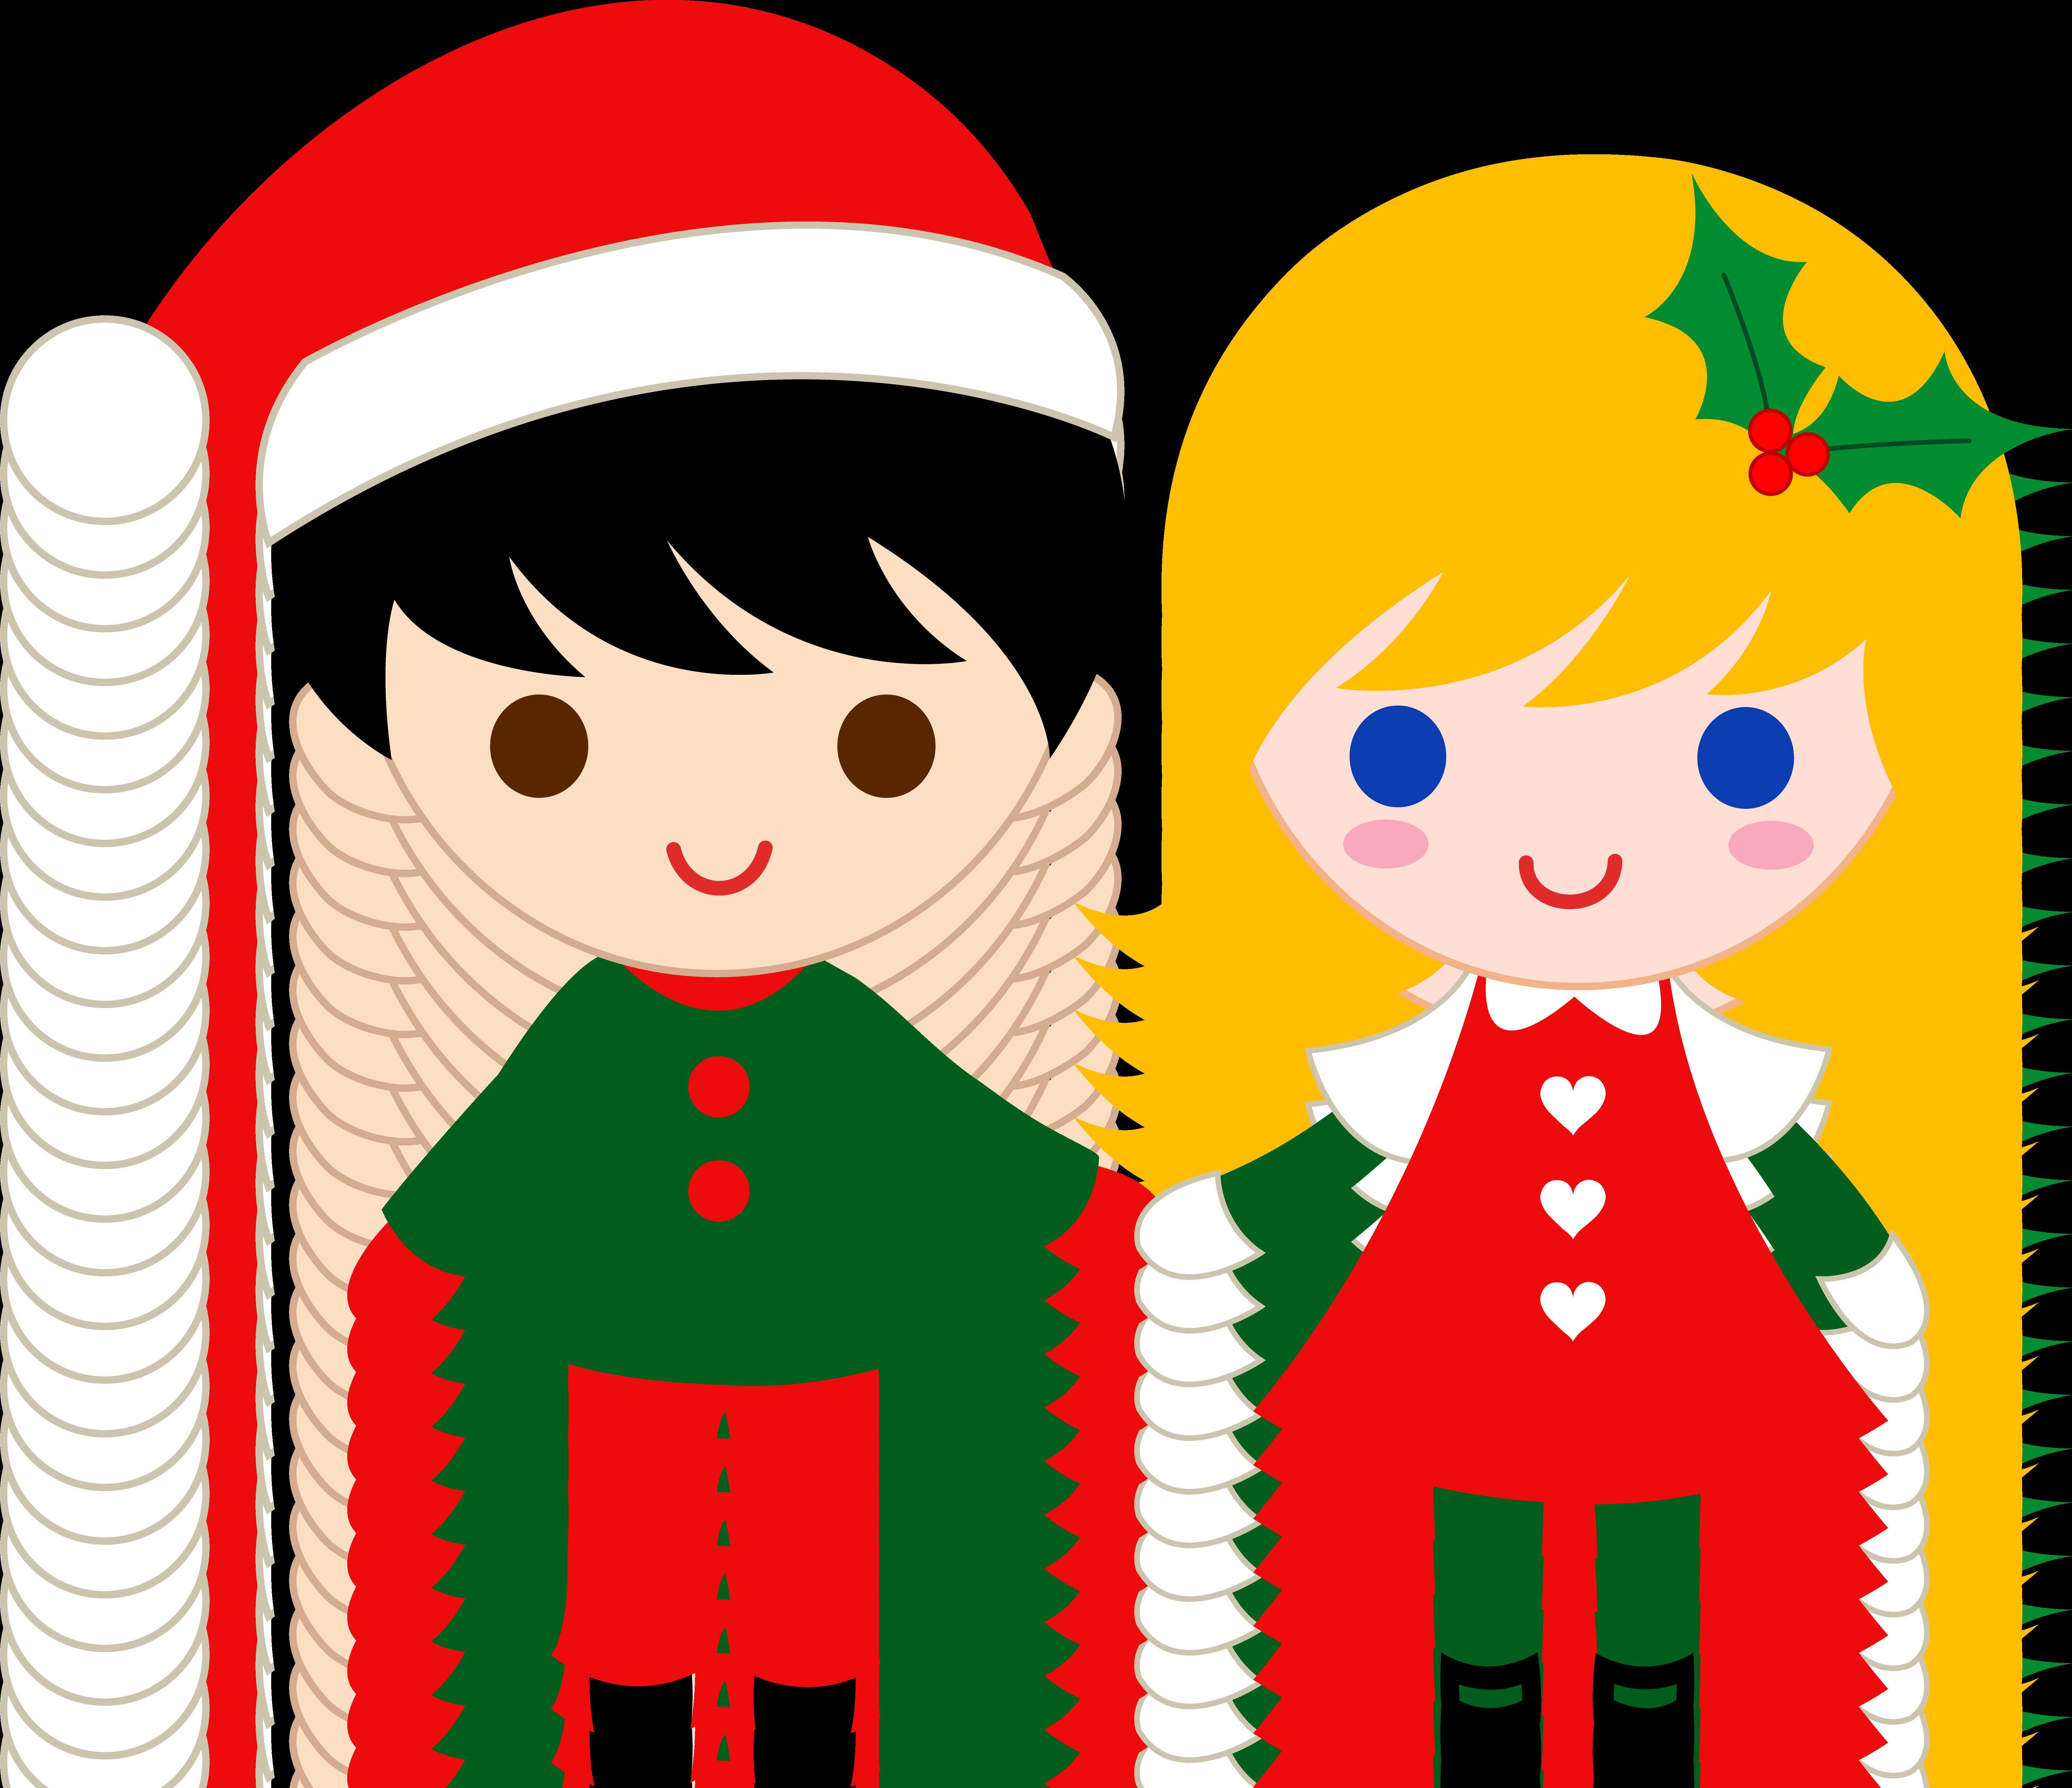 7105x6130 65 Awesome Cute Girl And Boy Clipart Cute Kids Clip Art